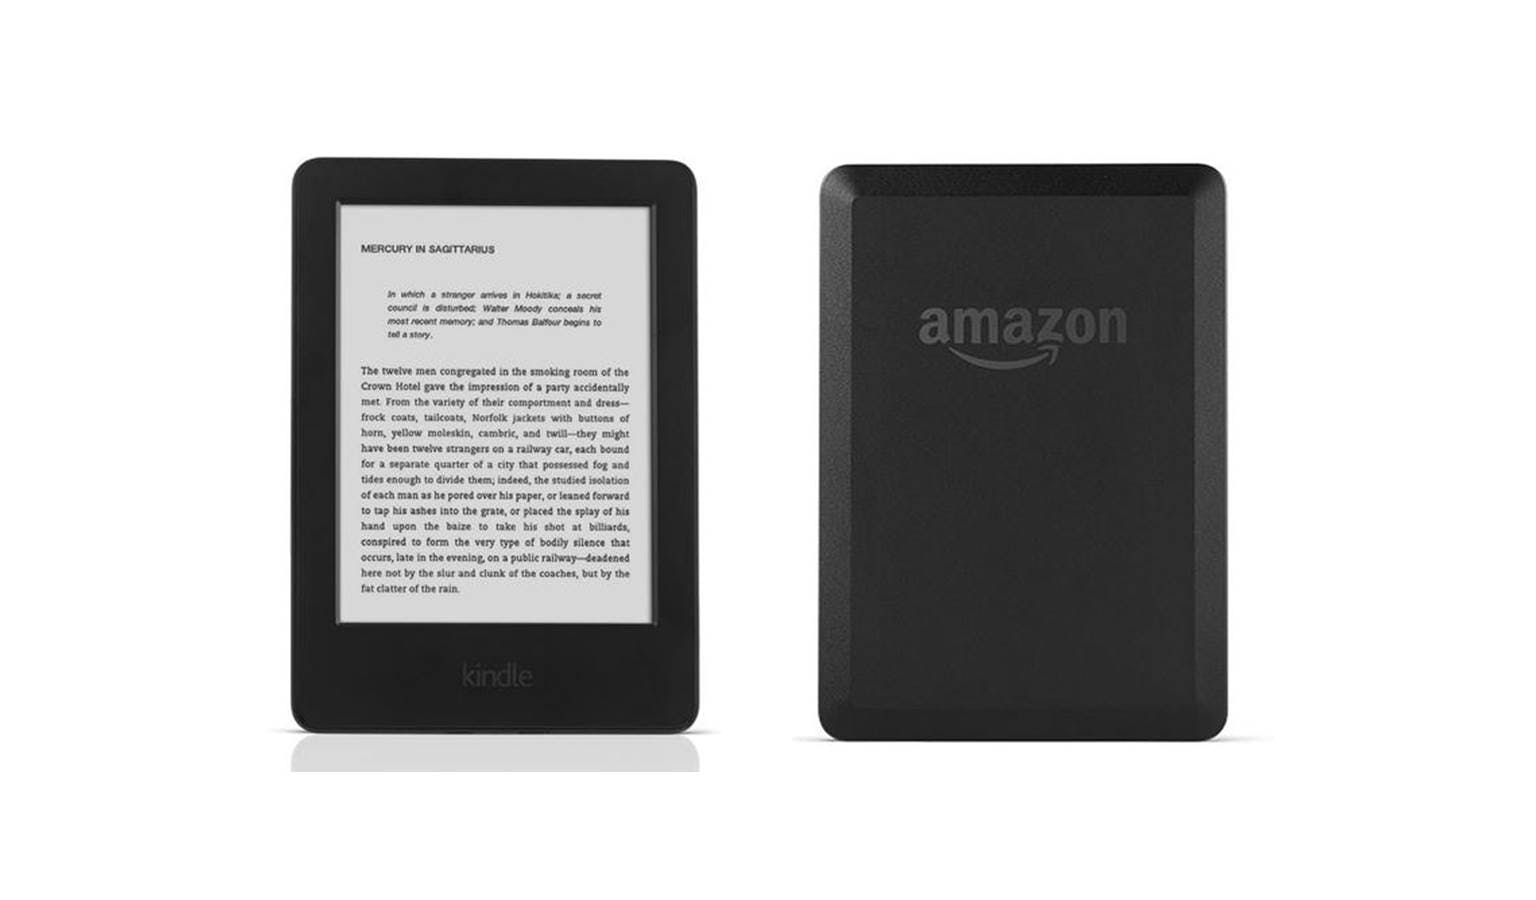 Amazon Kindle Paperwhite Generation 7 - Black